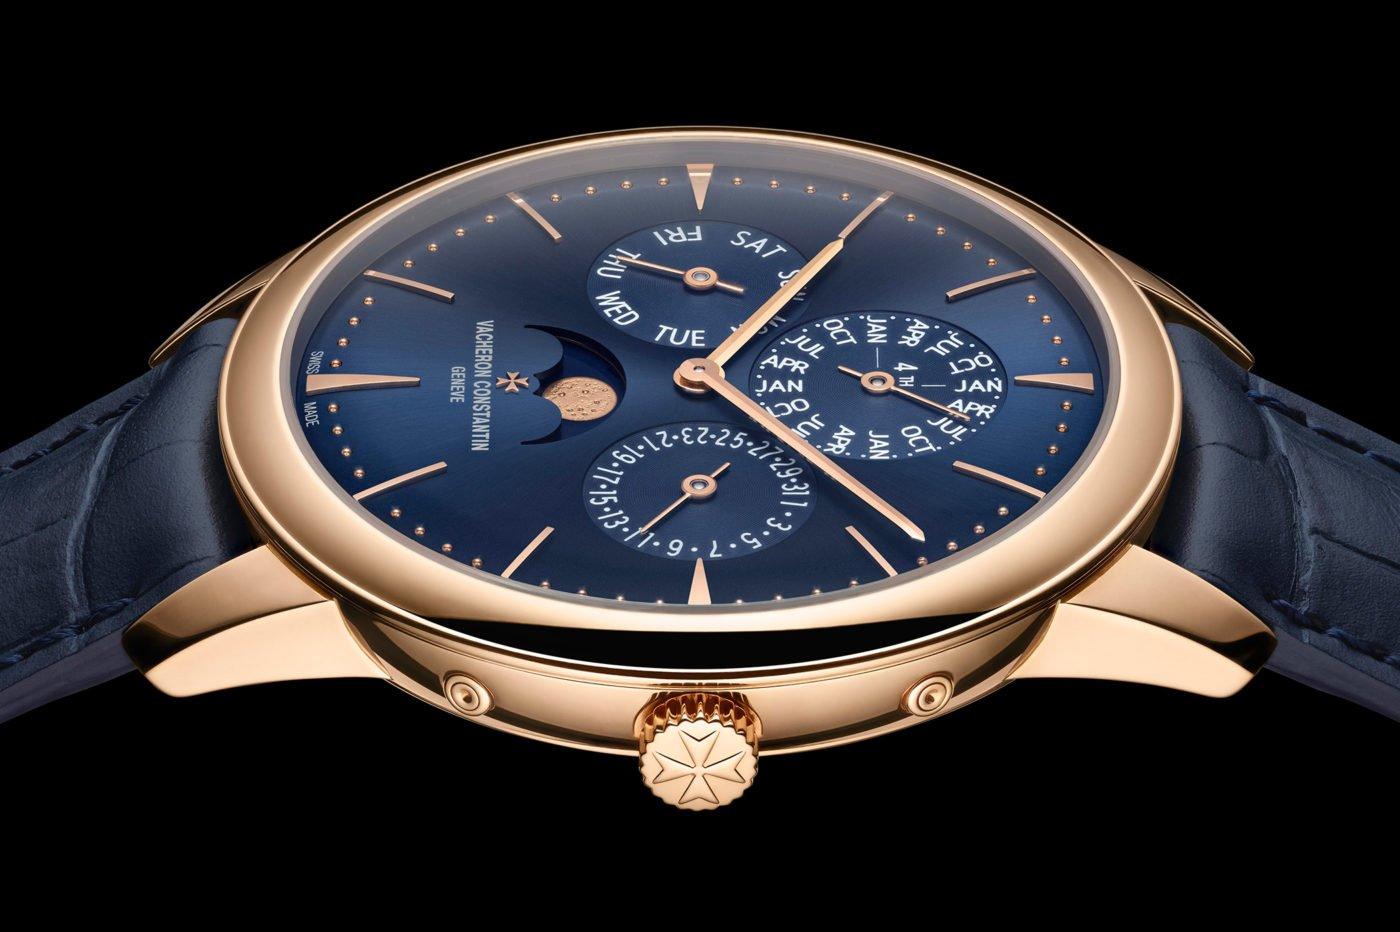 Vacheron Constantin Patrimony Perpetual Calendar Ultra-Thin na niebiesko [dostępność, cena]